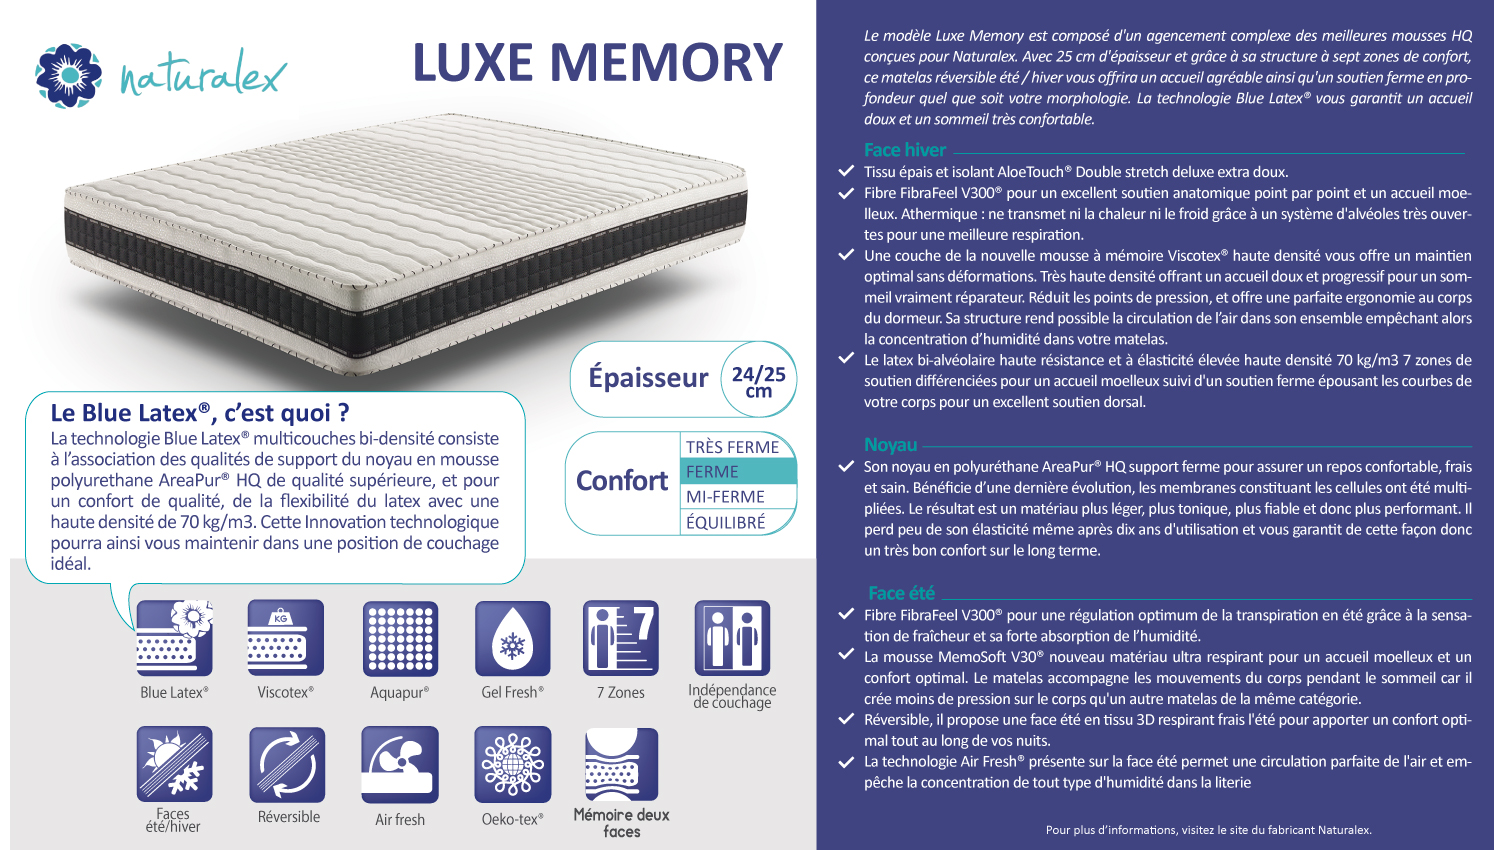 matelas m moire luxe memory 140x190 cm mousse blue latex 7 zones huate densit. Black Bedroom Furniture Sets. Home Design Ideas